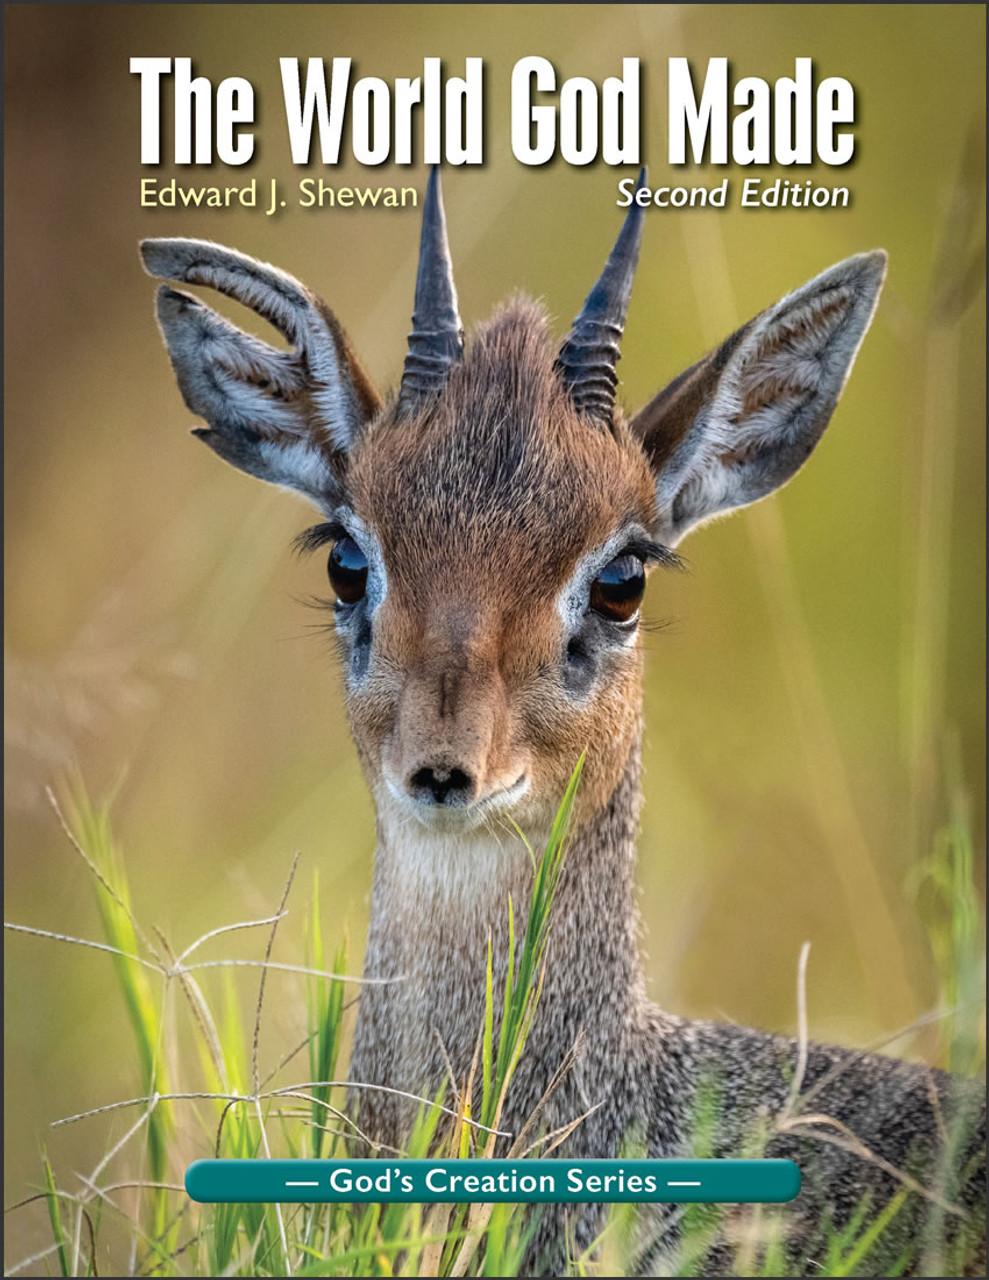 World God Made, 2nd edition